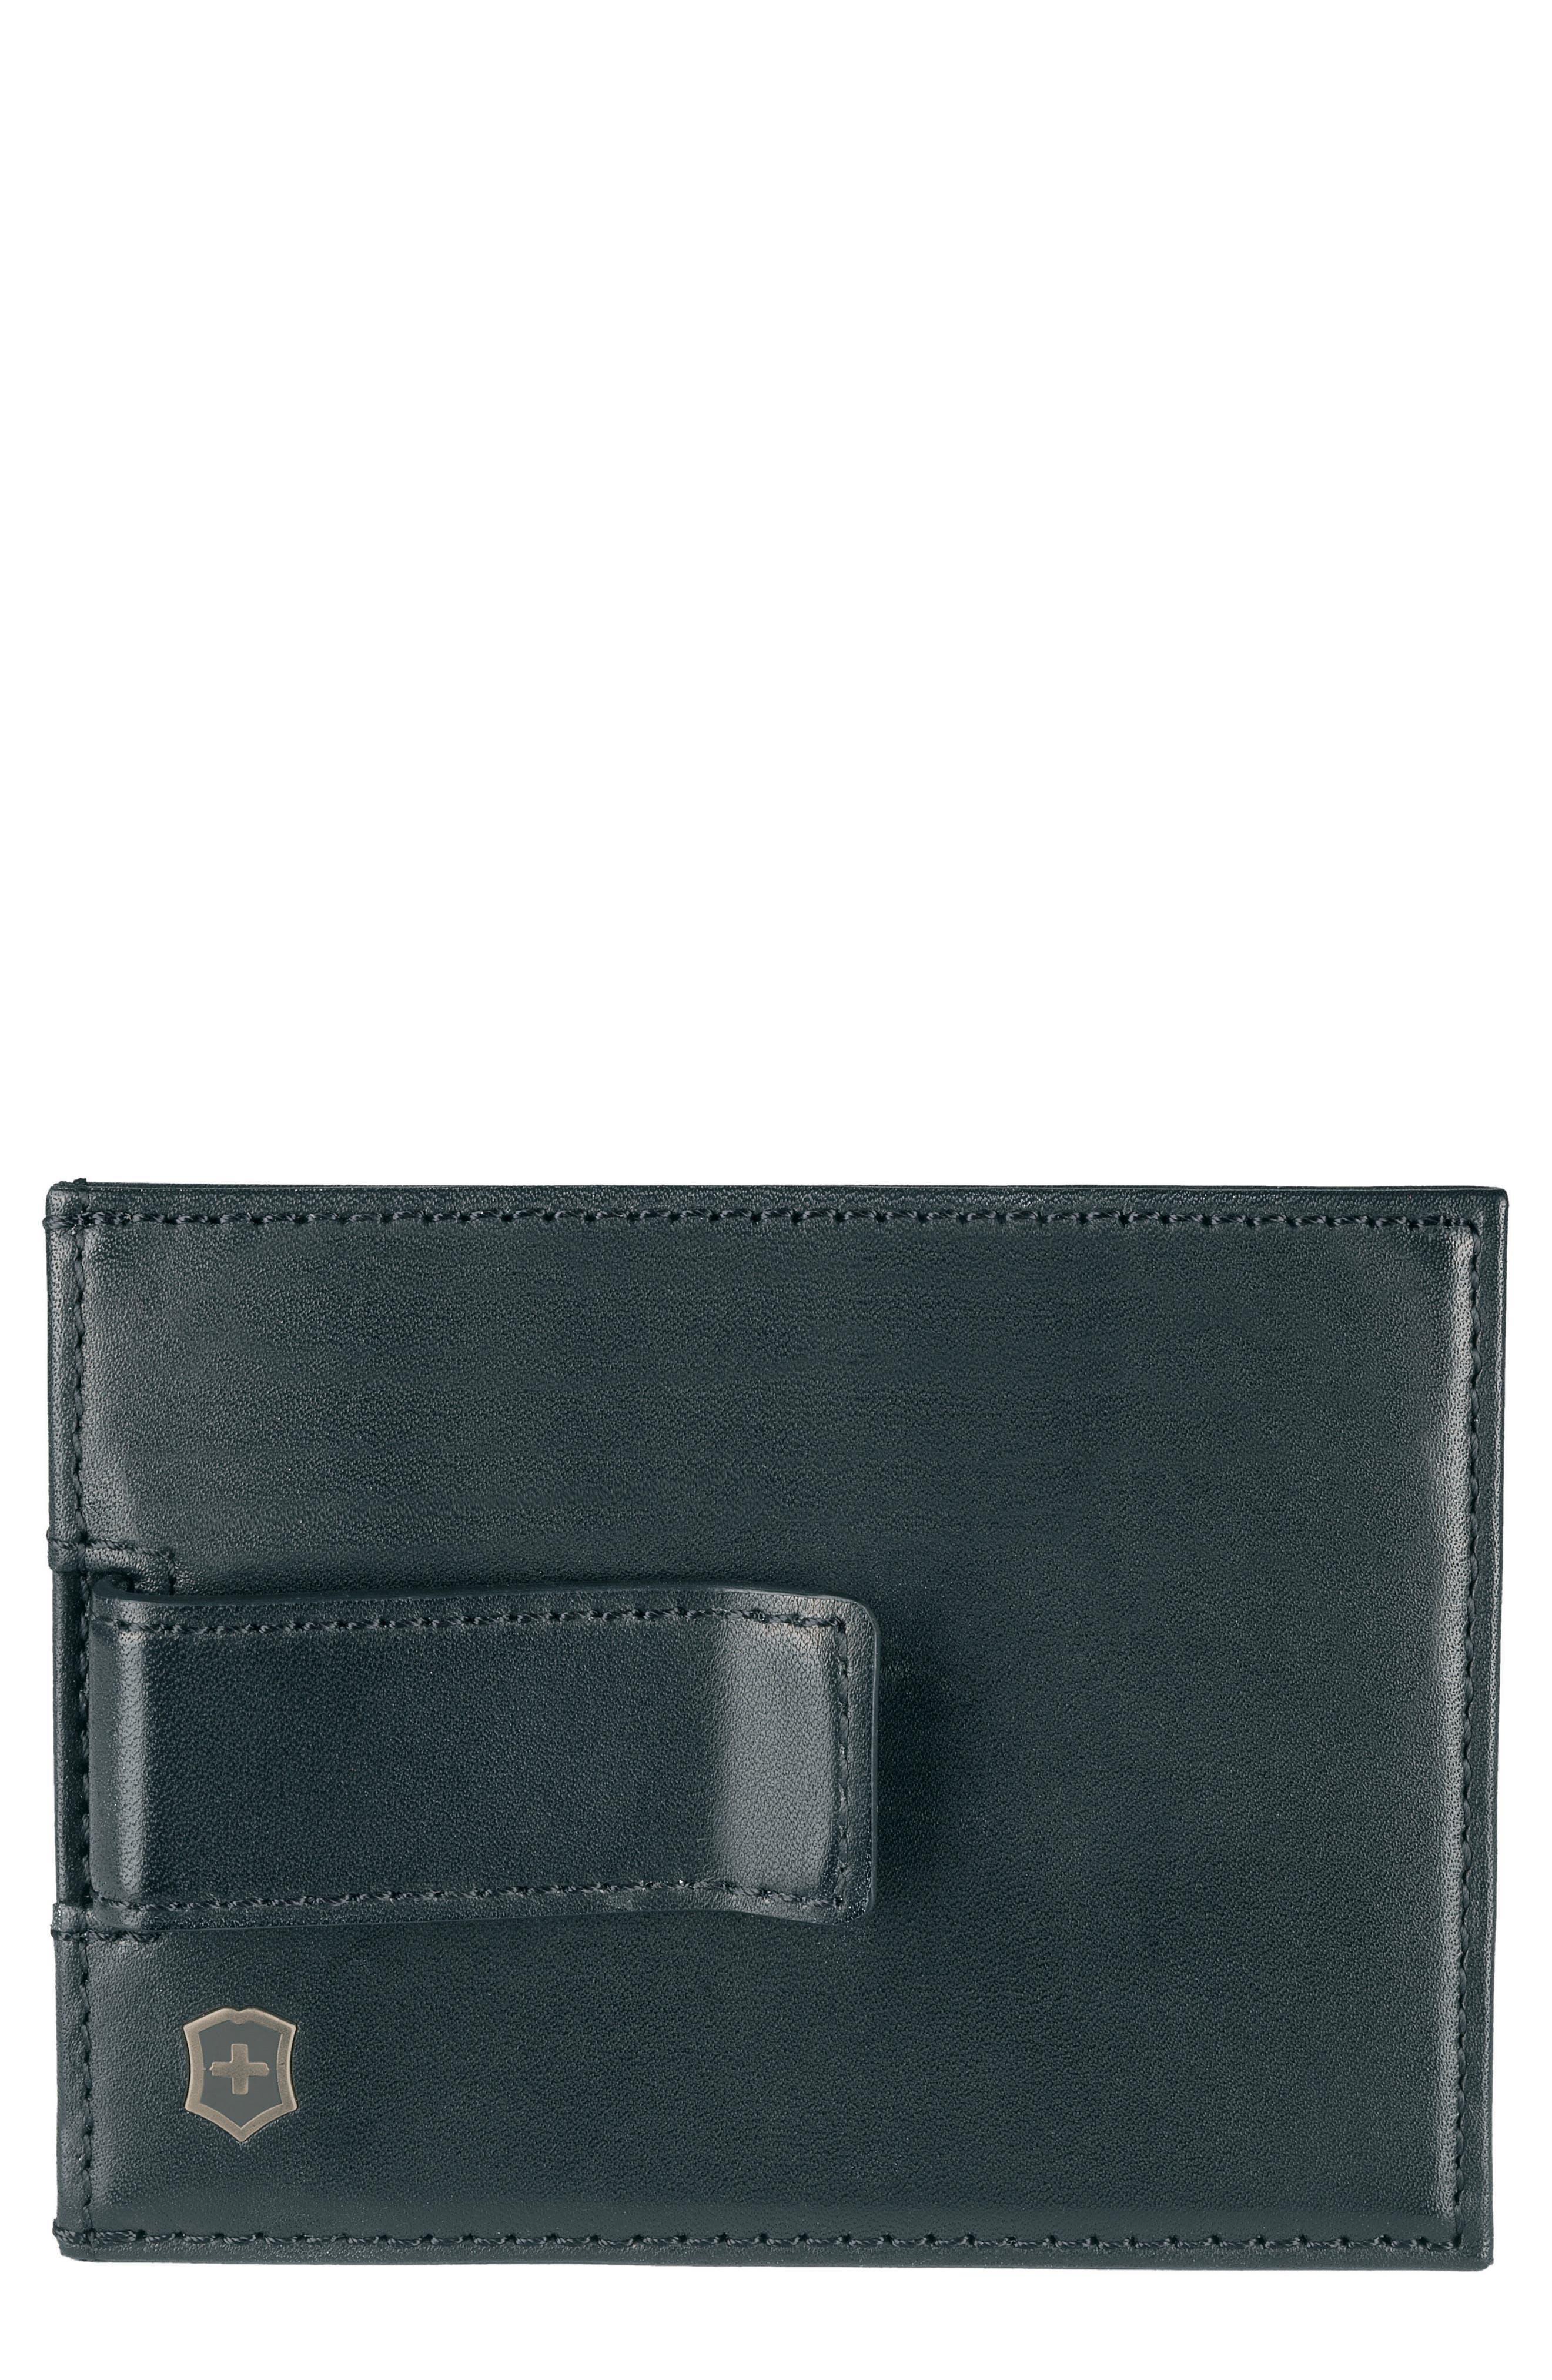 Altius Edge Napier Card Case,                         Main,                         color, Black